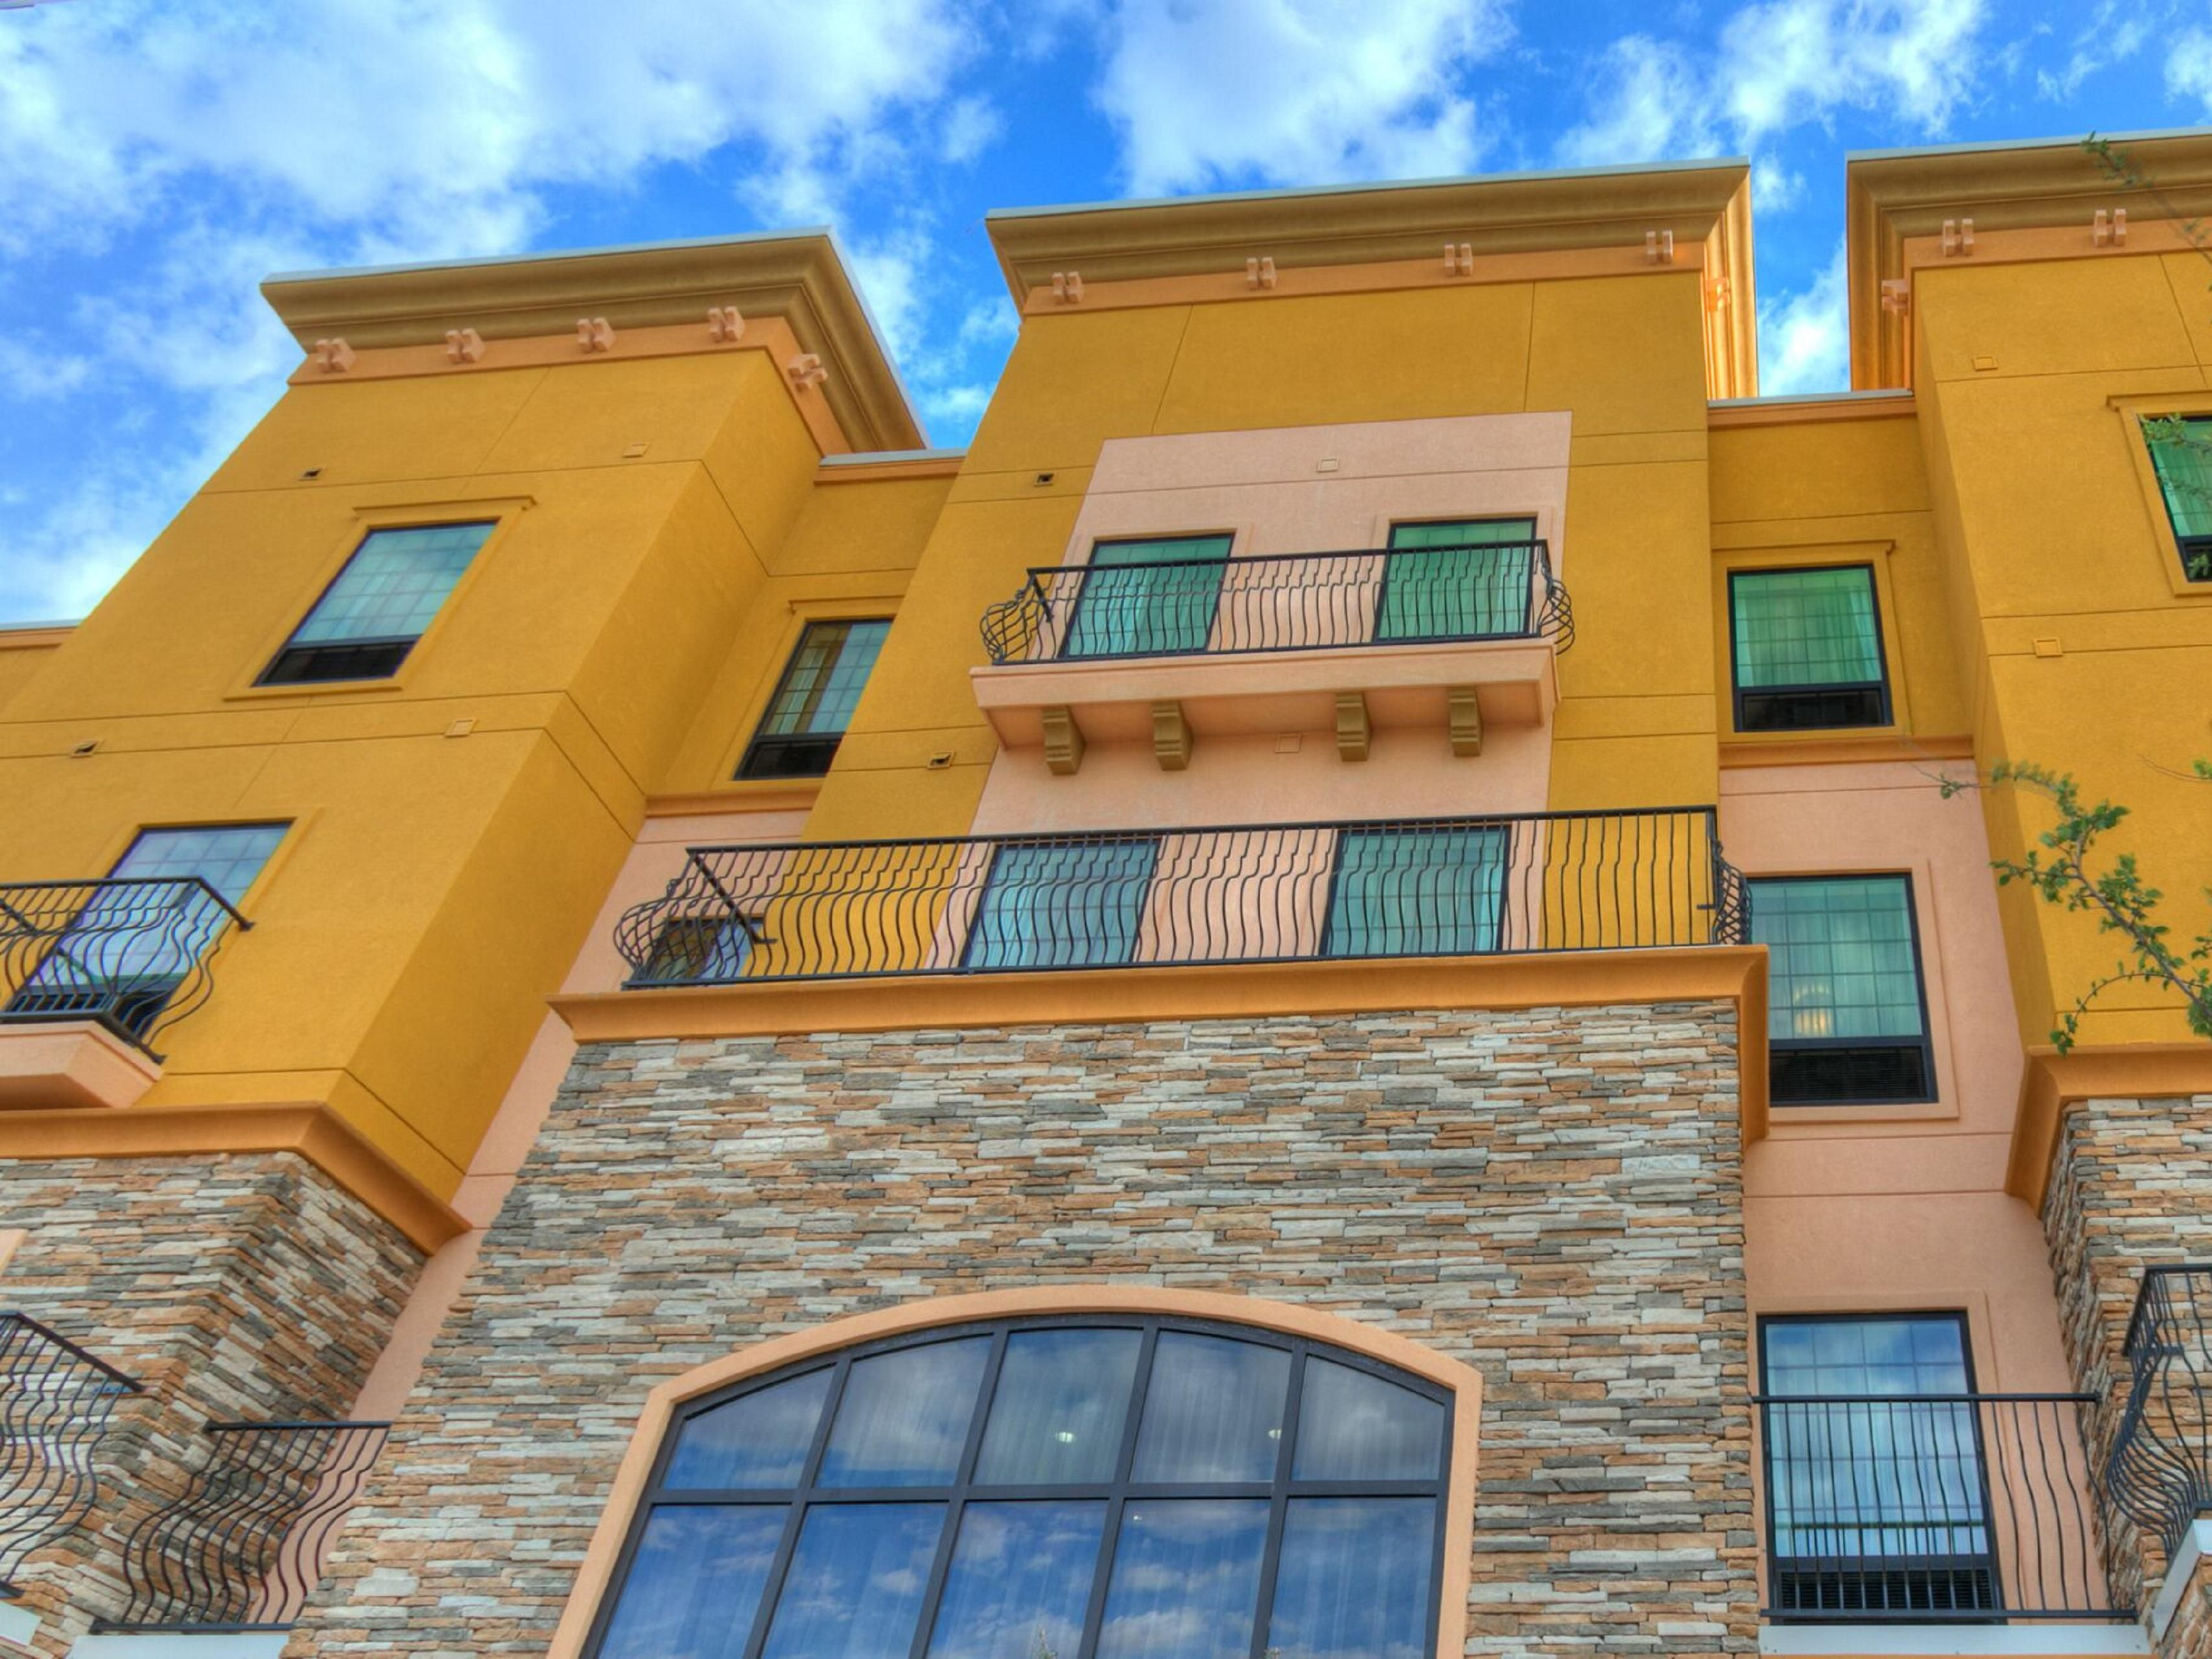 Lubbock Hotels: Staybridge Suites Lubbock South - Extended